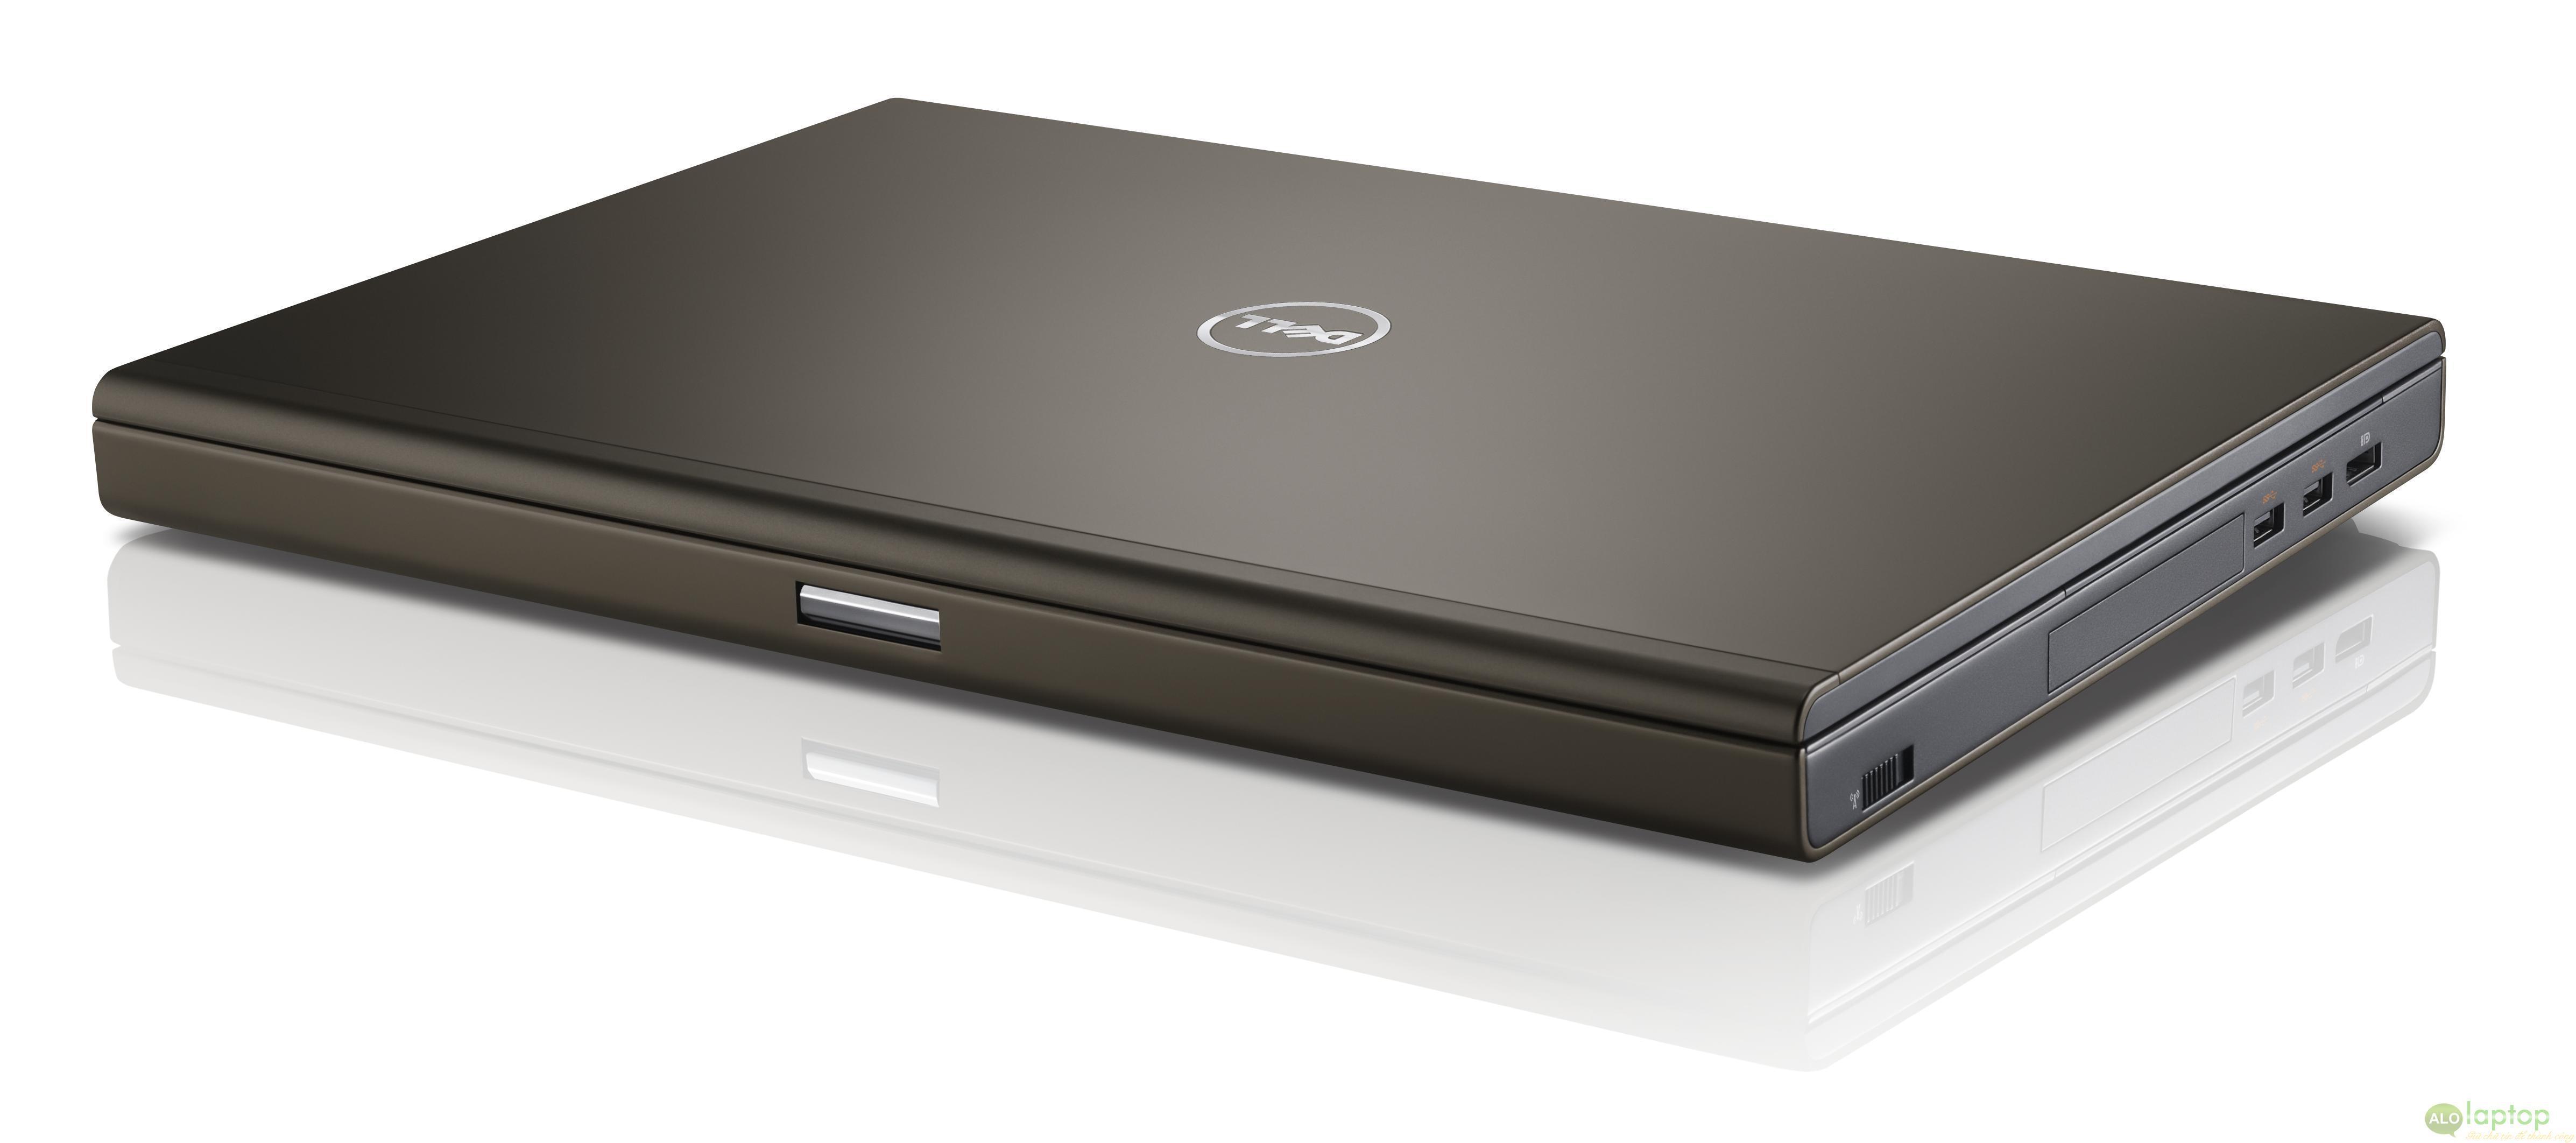 cua-hang-ban-laptop-dell-precision-m4600-tai-ha-noi